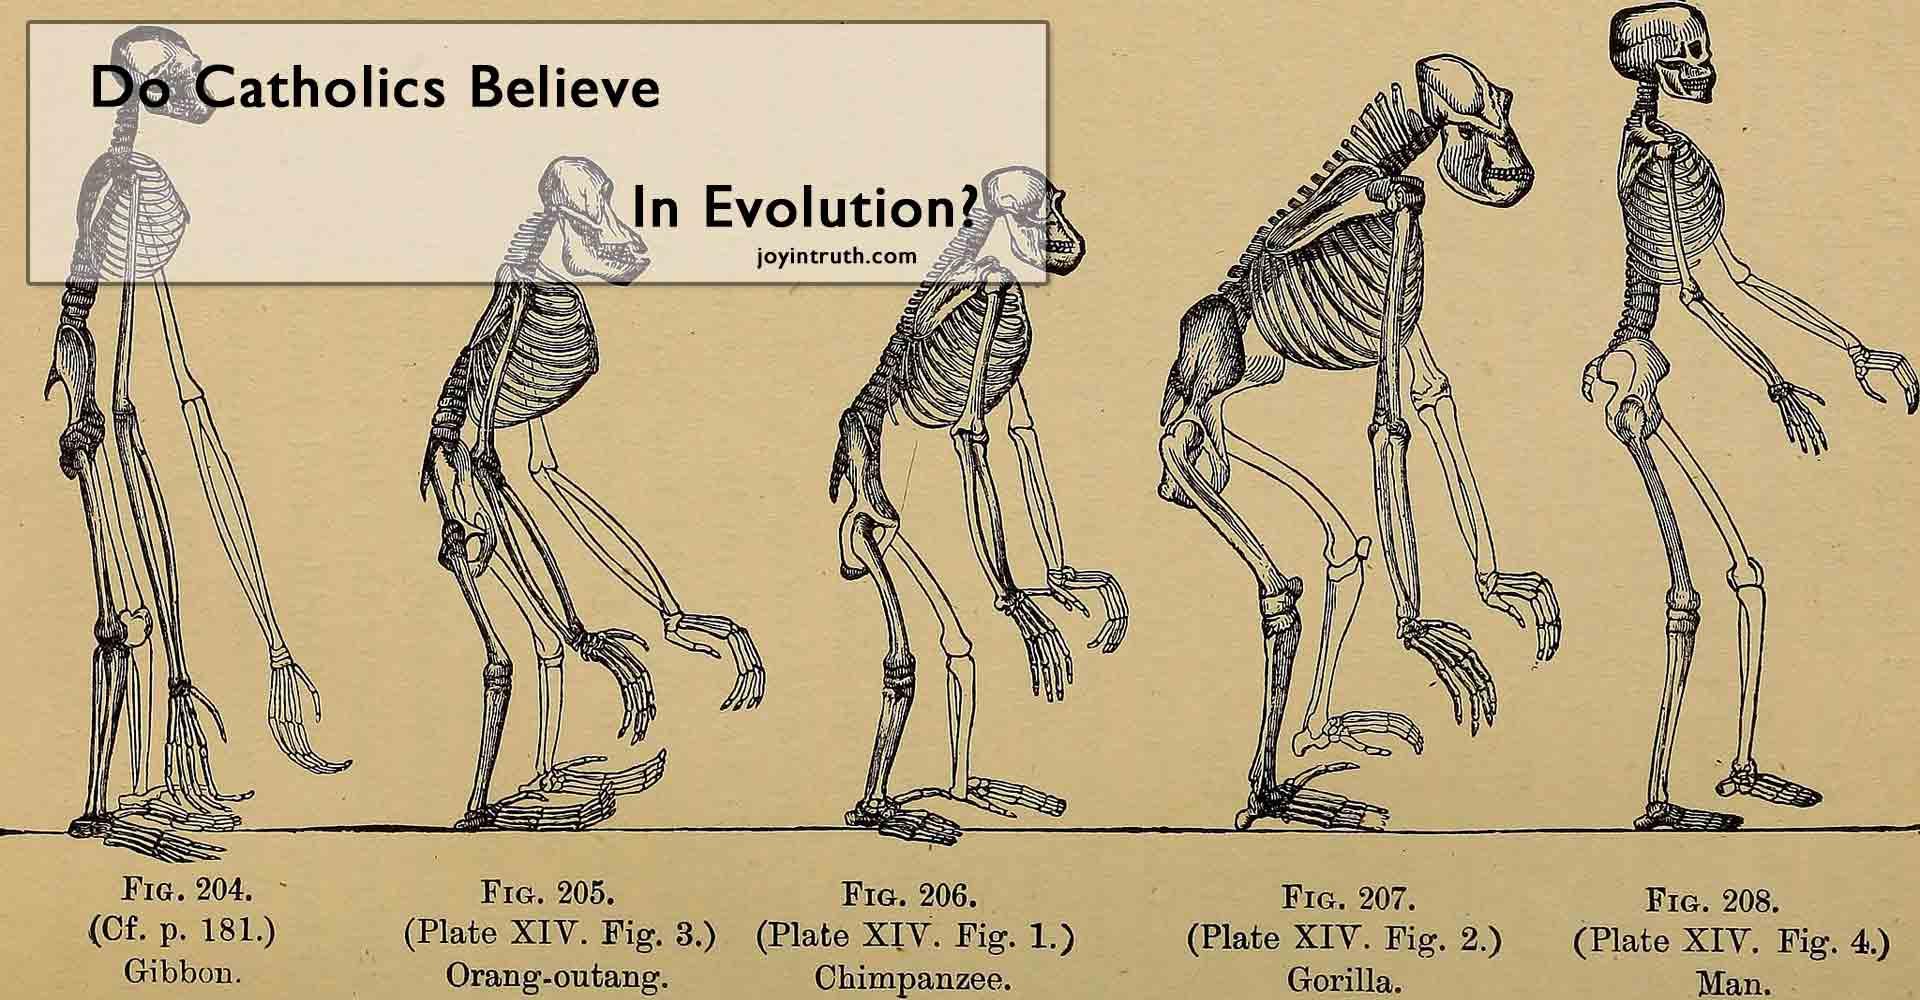 catholics and evolution